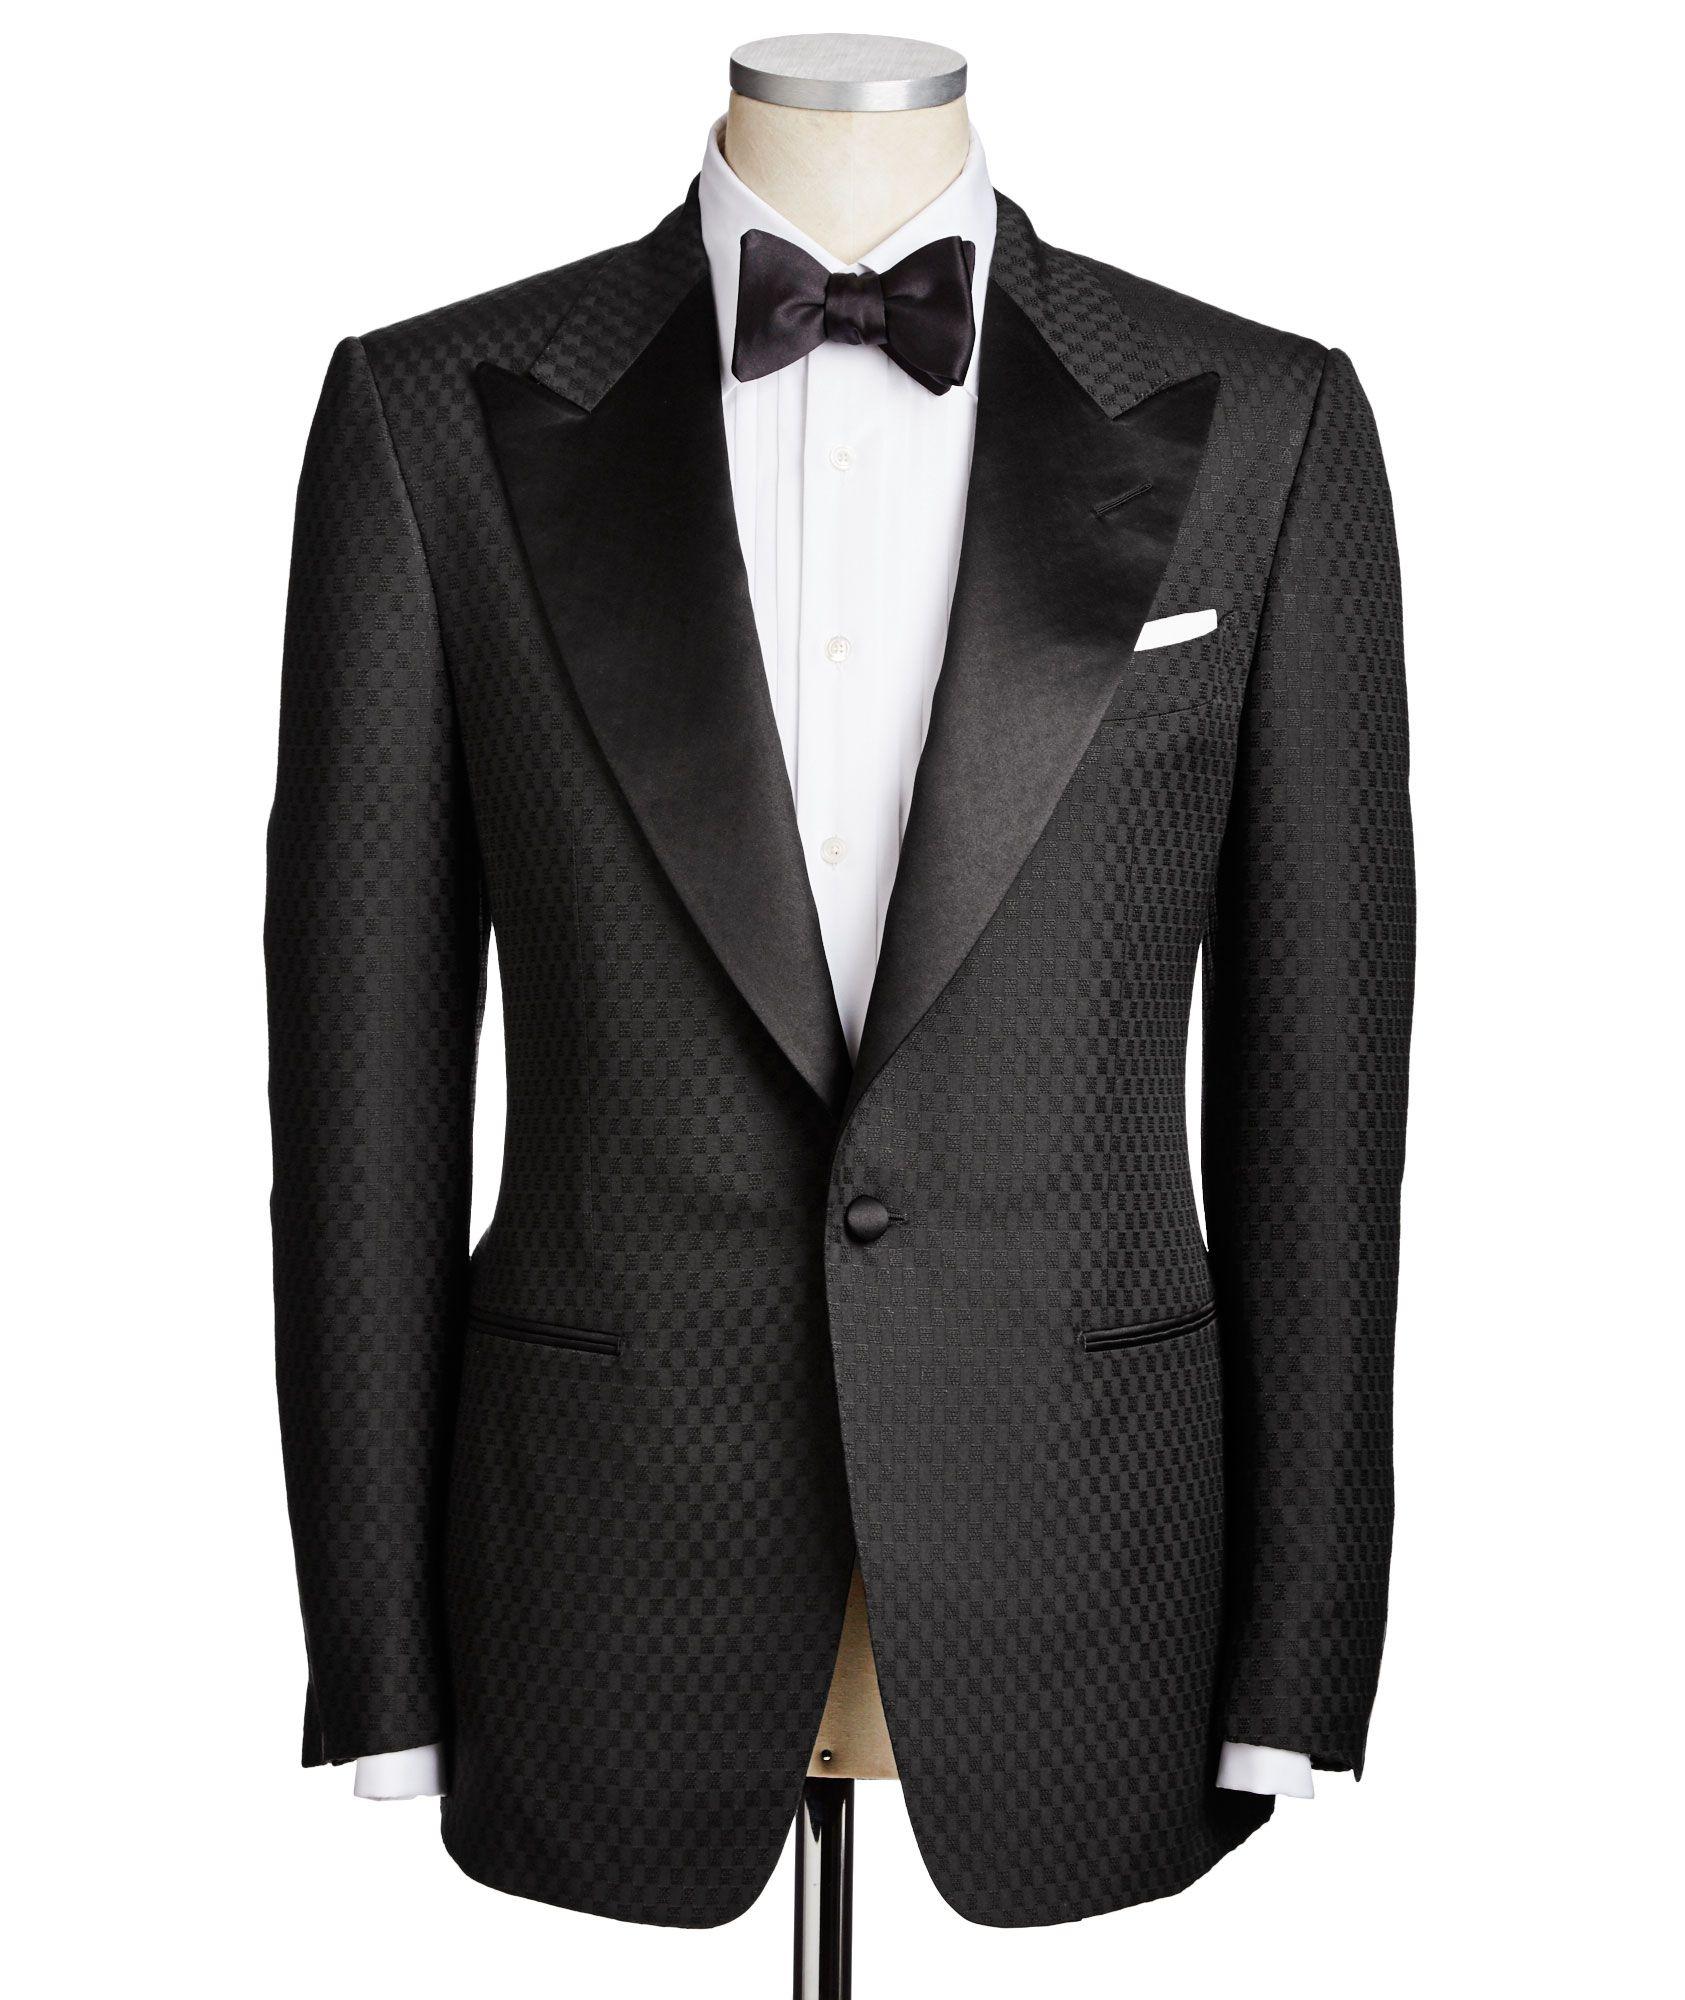 Tom Ford Tuxedo Jacket Tuxedos Harry Rosen Dress